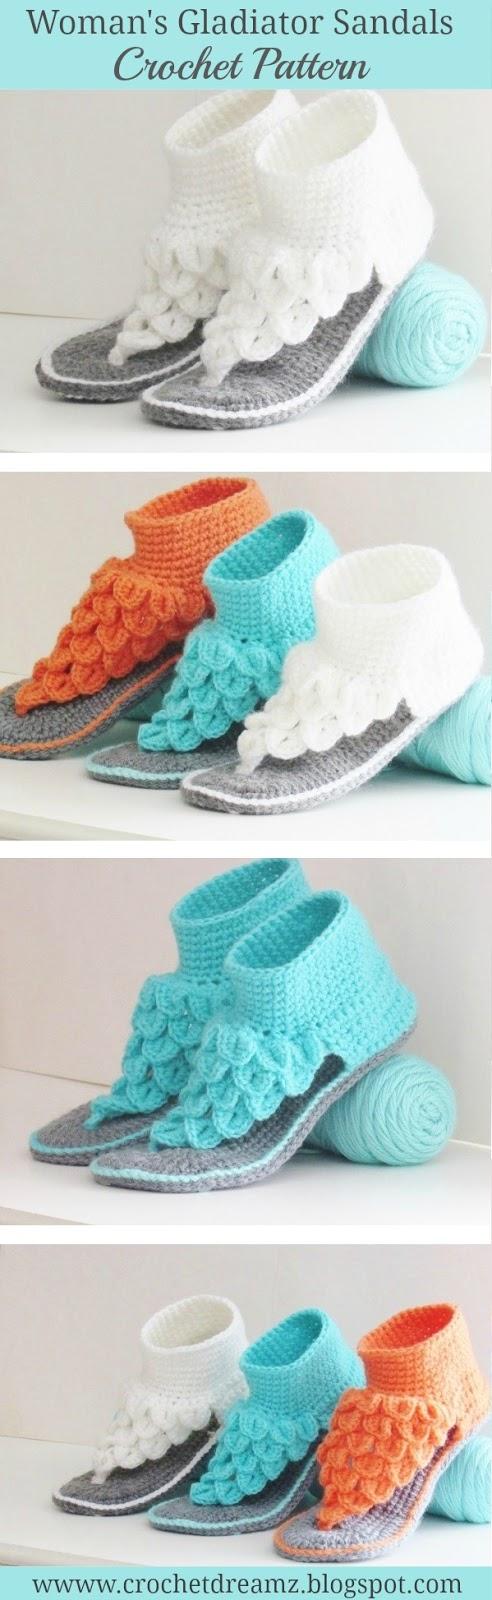 Crocodile Stitch Gladiator Sandals Crochet Pattern for Woman